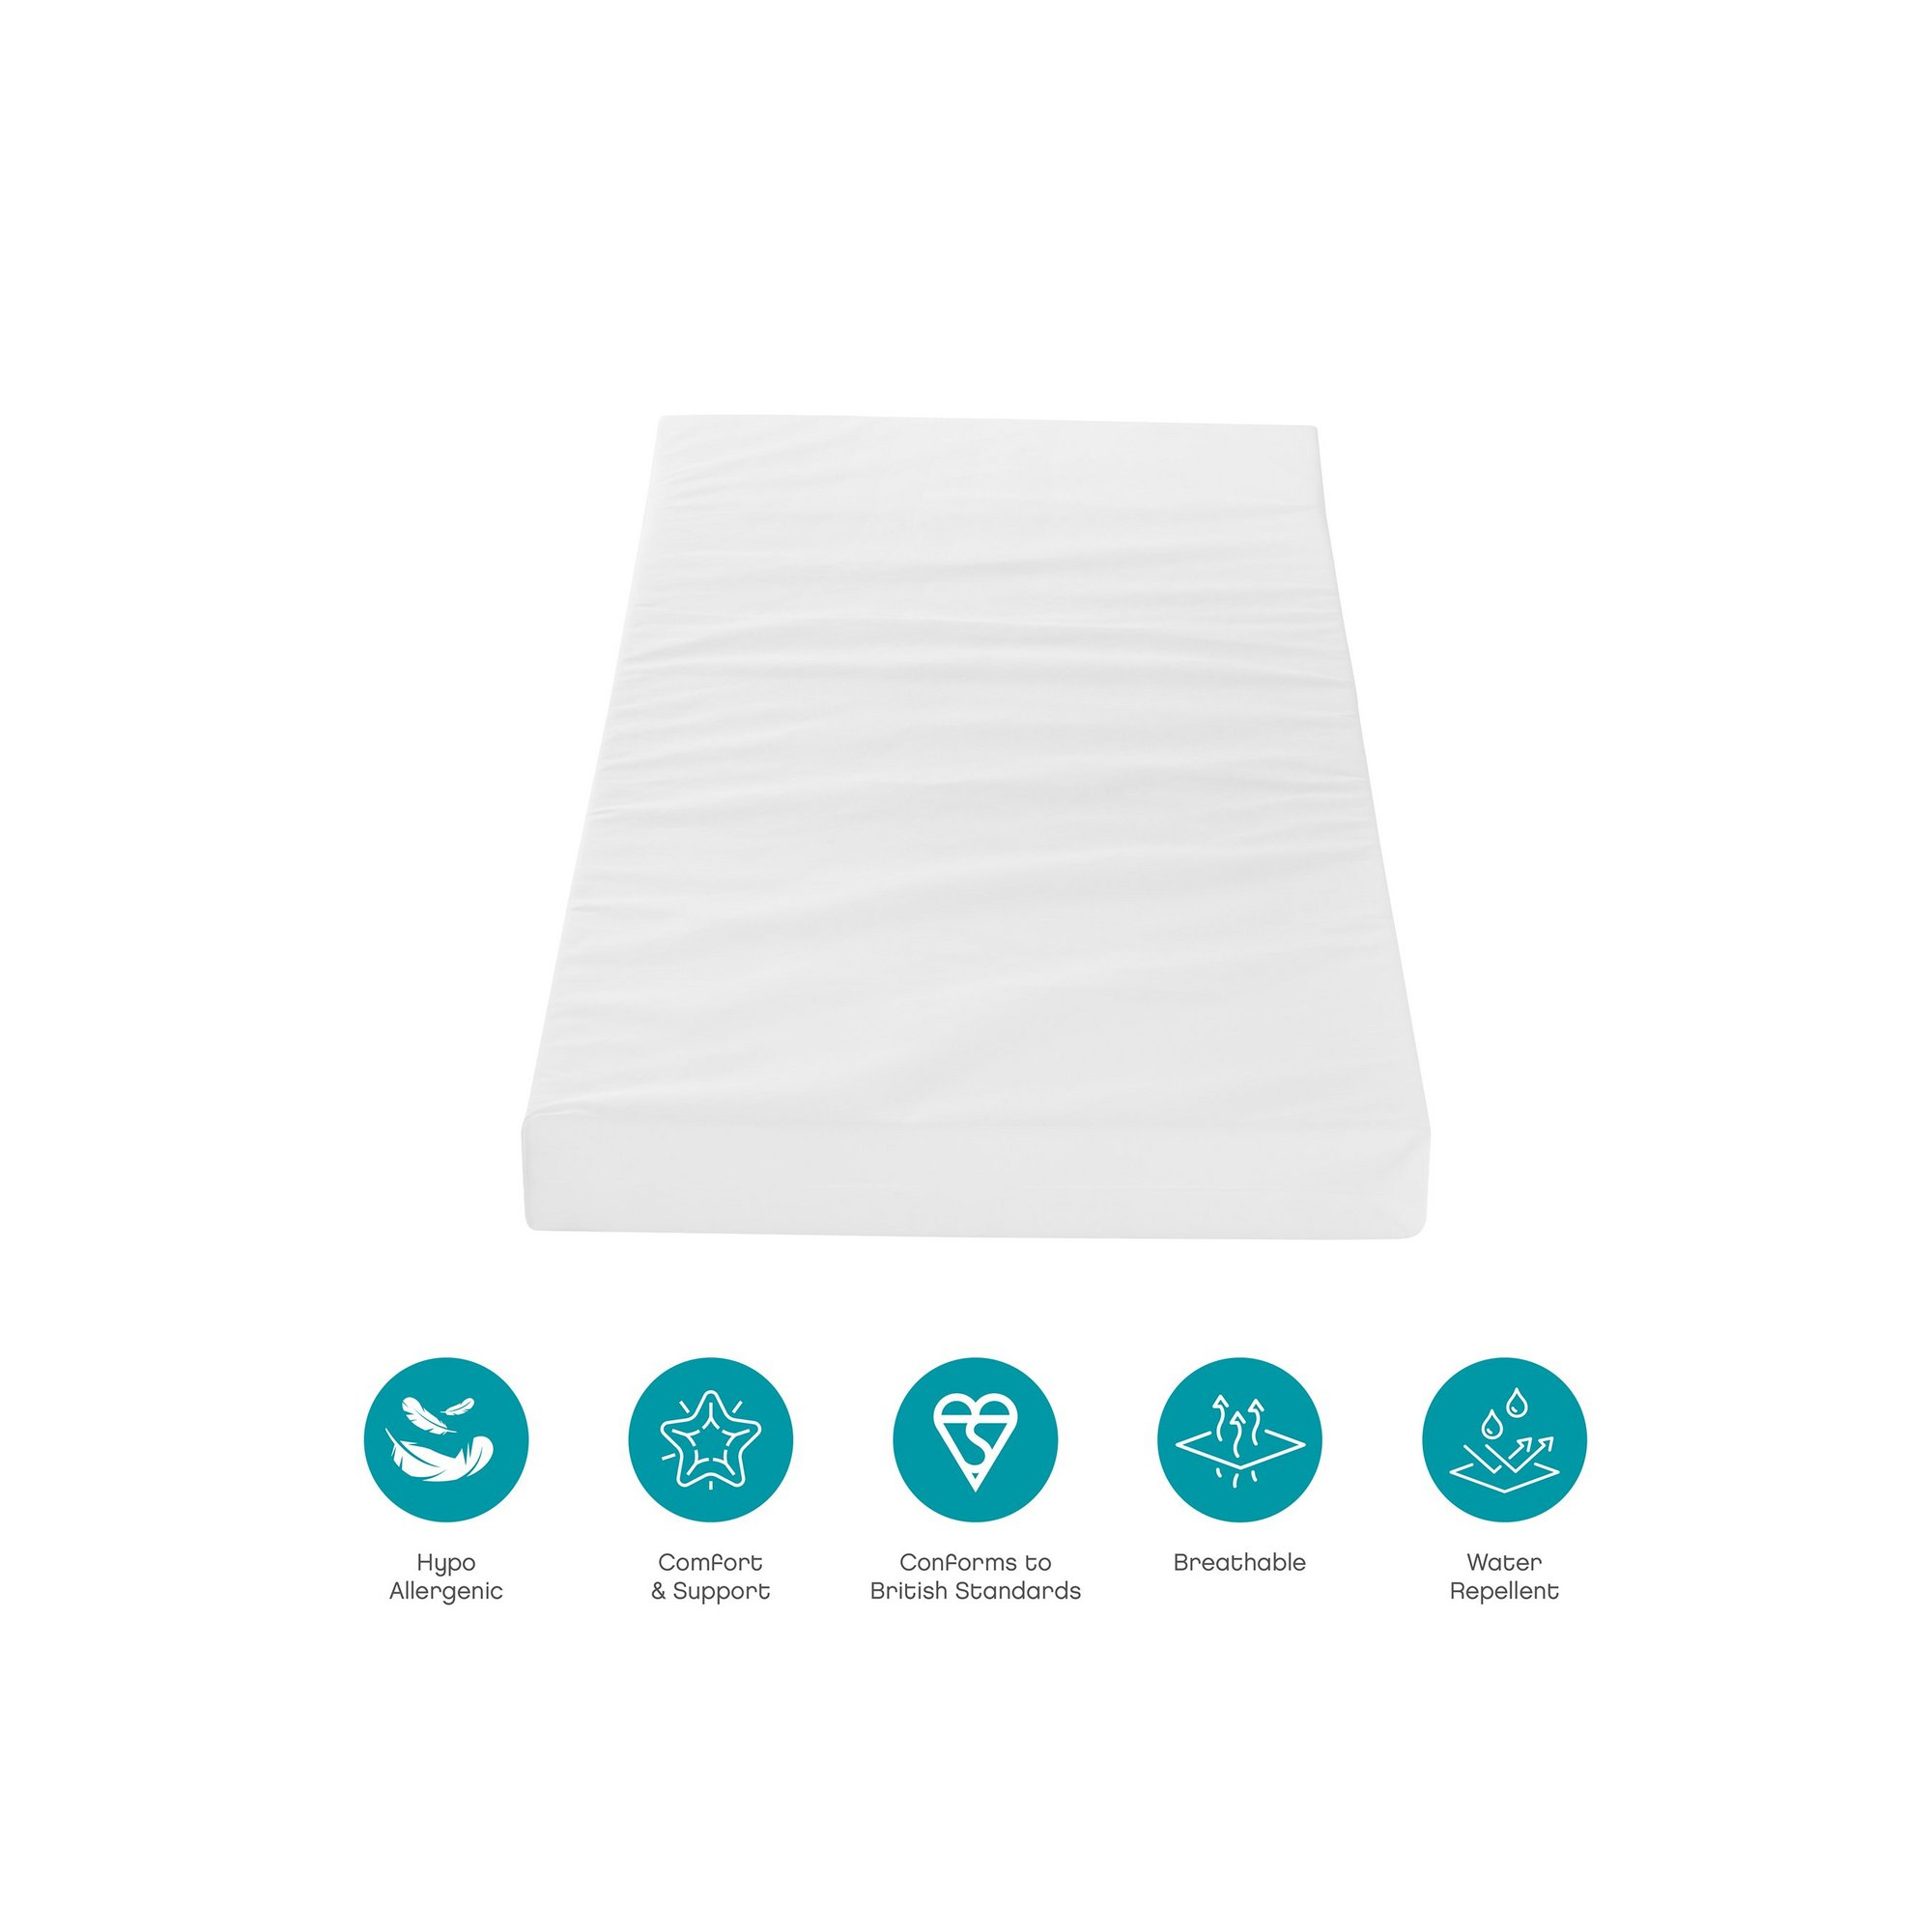 Image of Foam Cot Bed Mattress (70 x 140 cm)